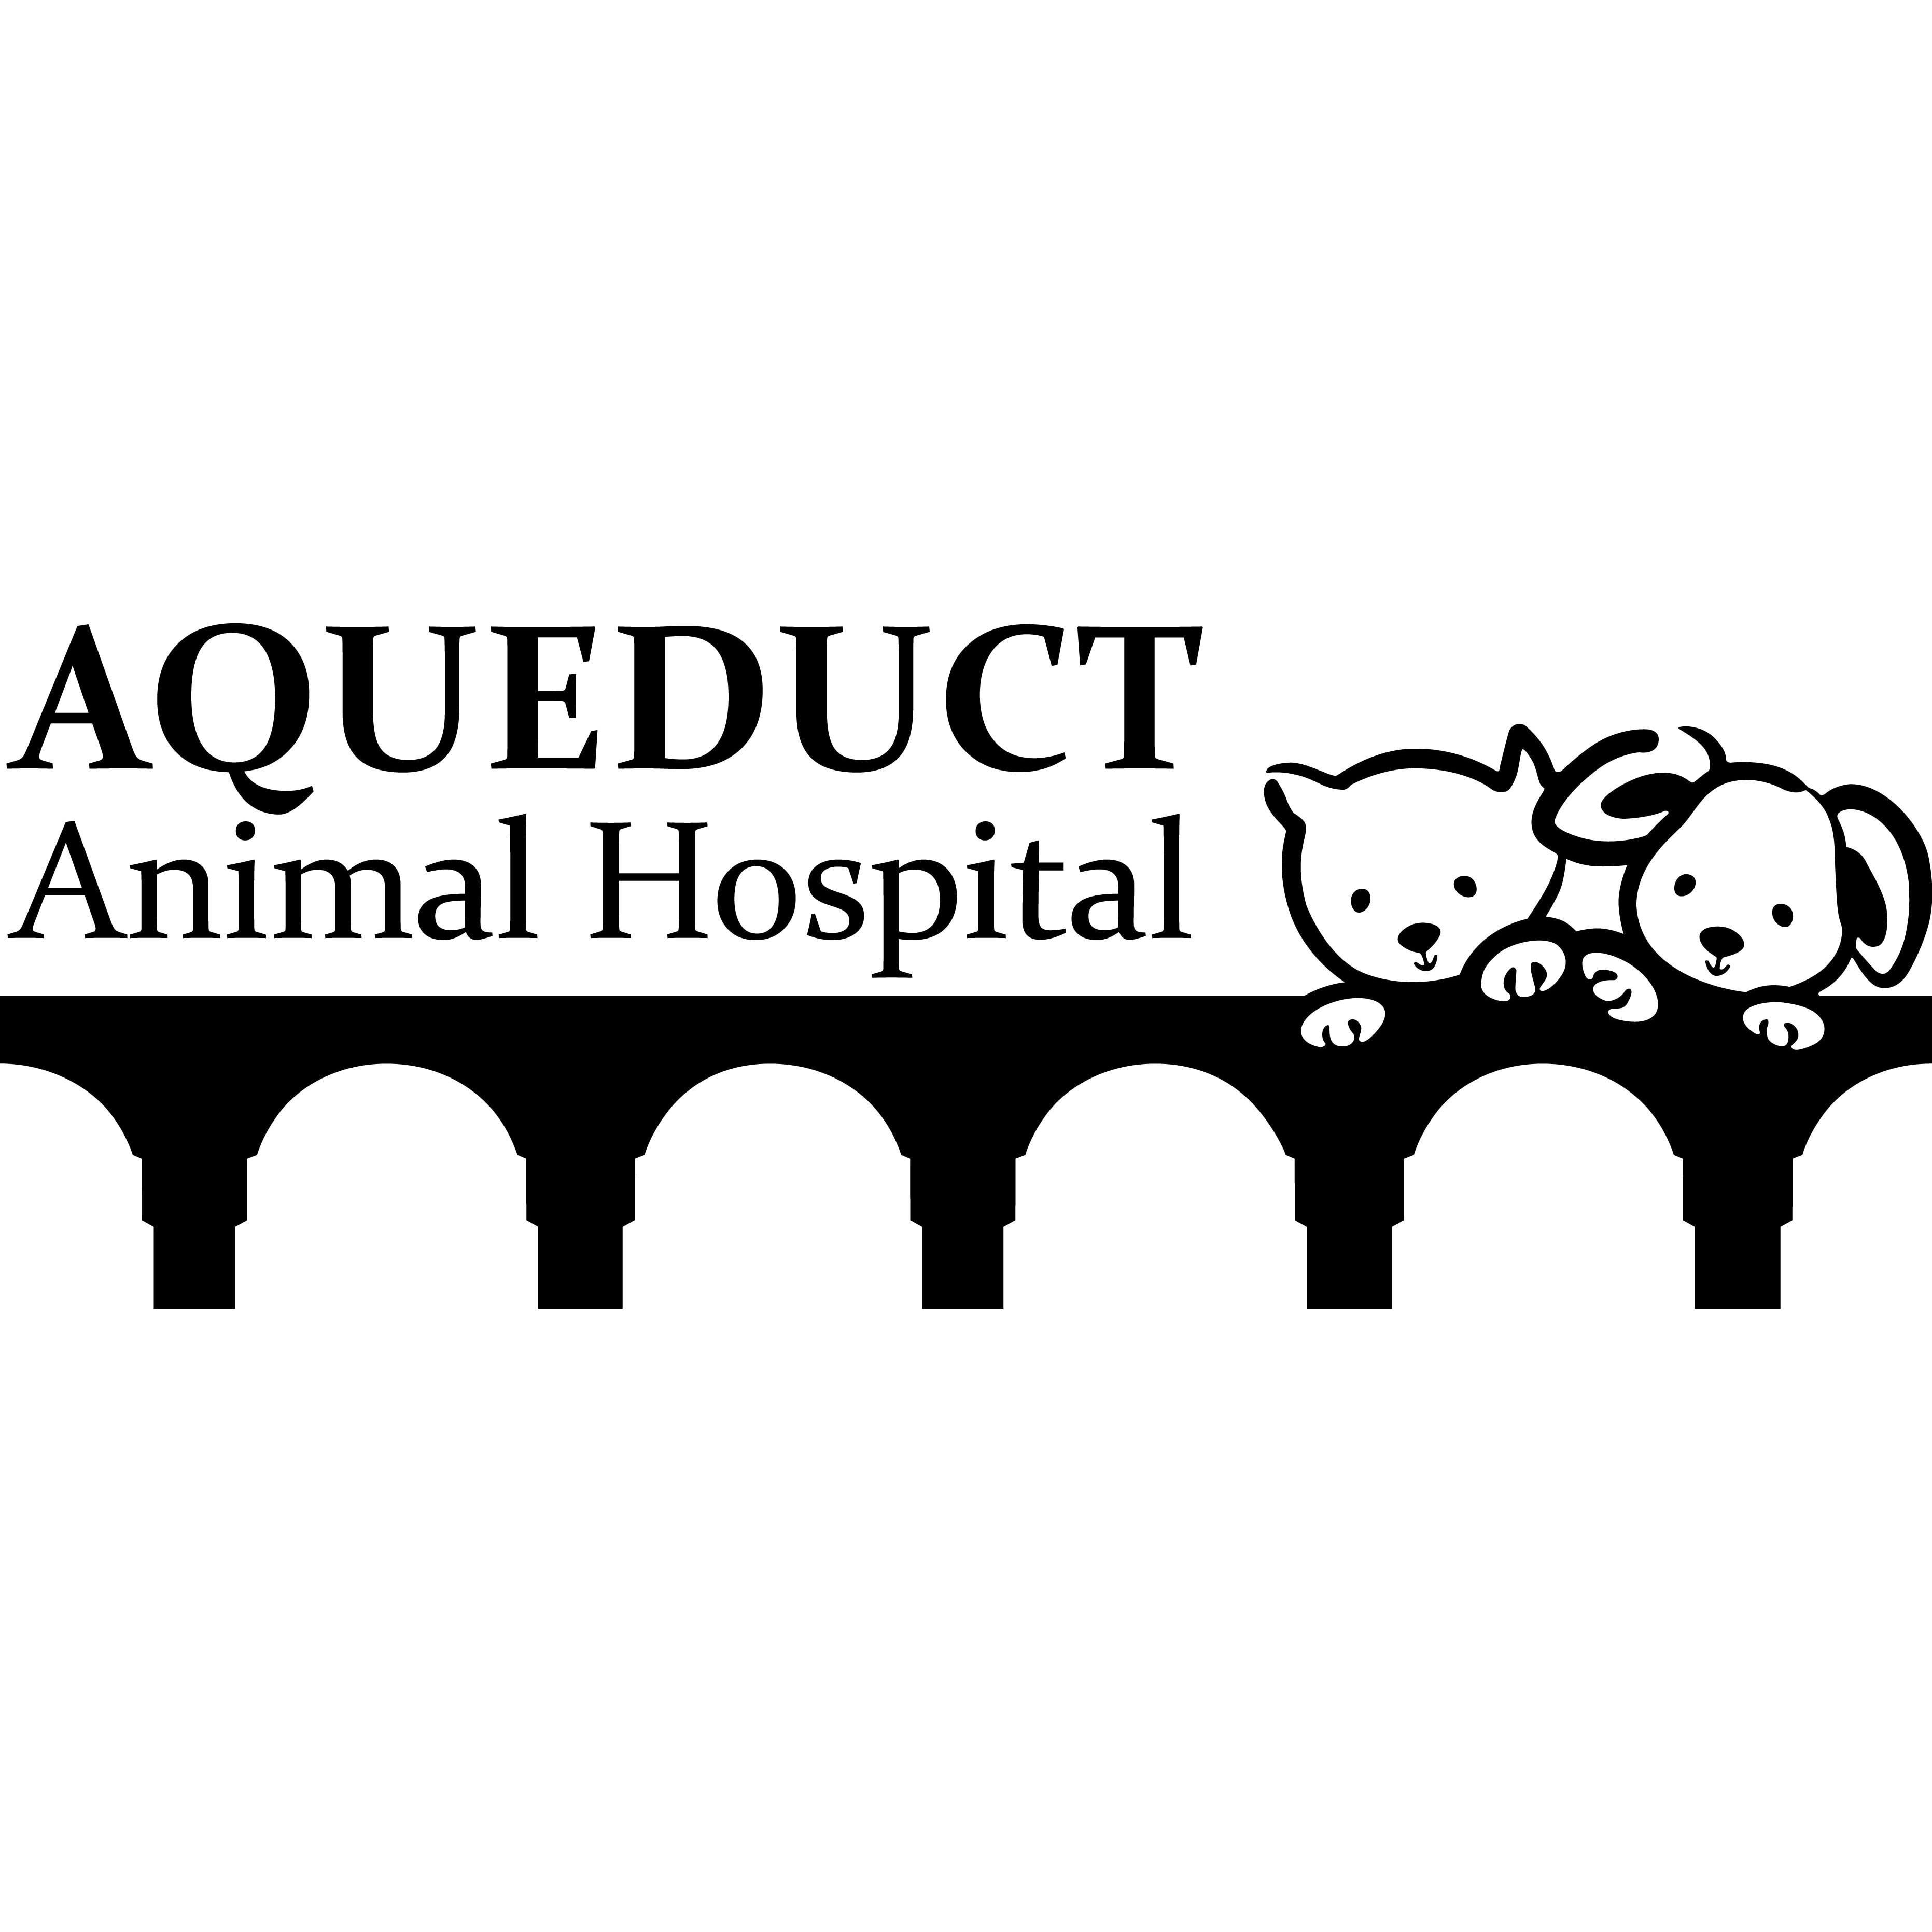 Aqueduct Animal Hospital 1